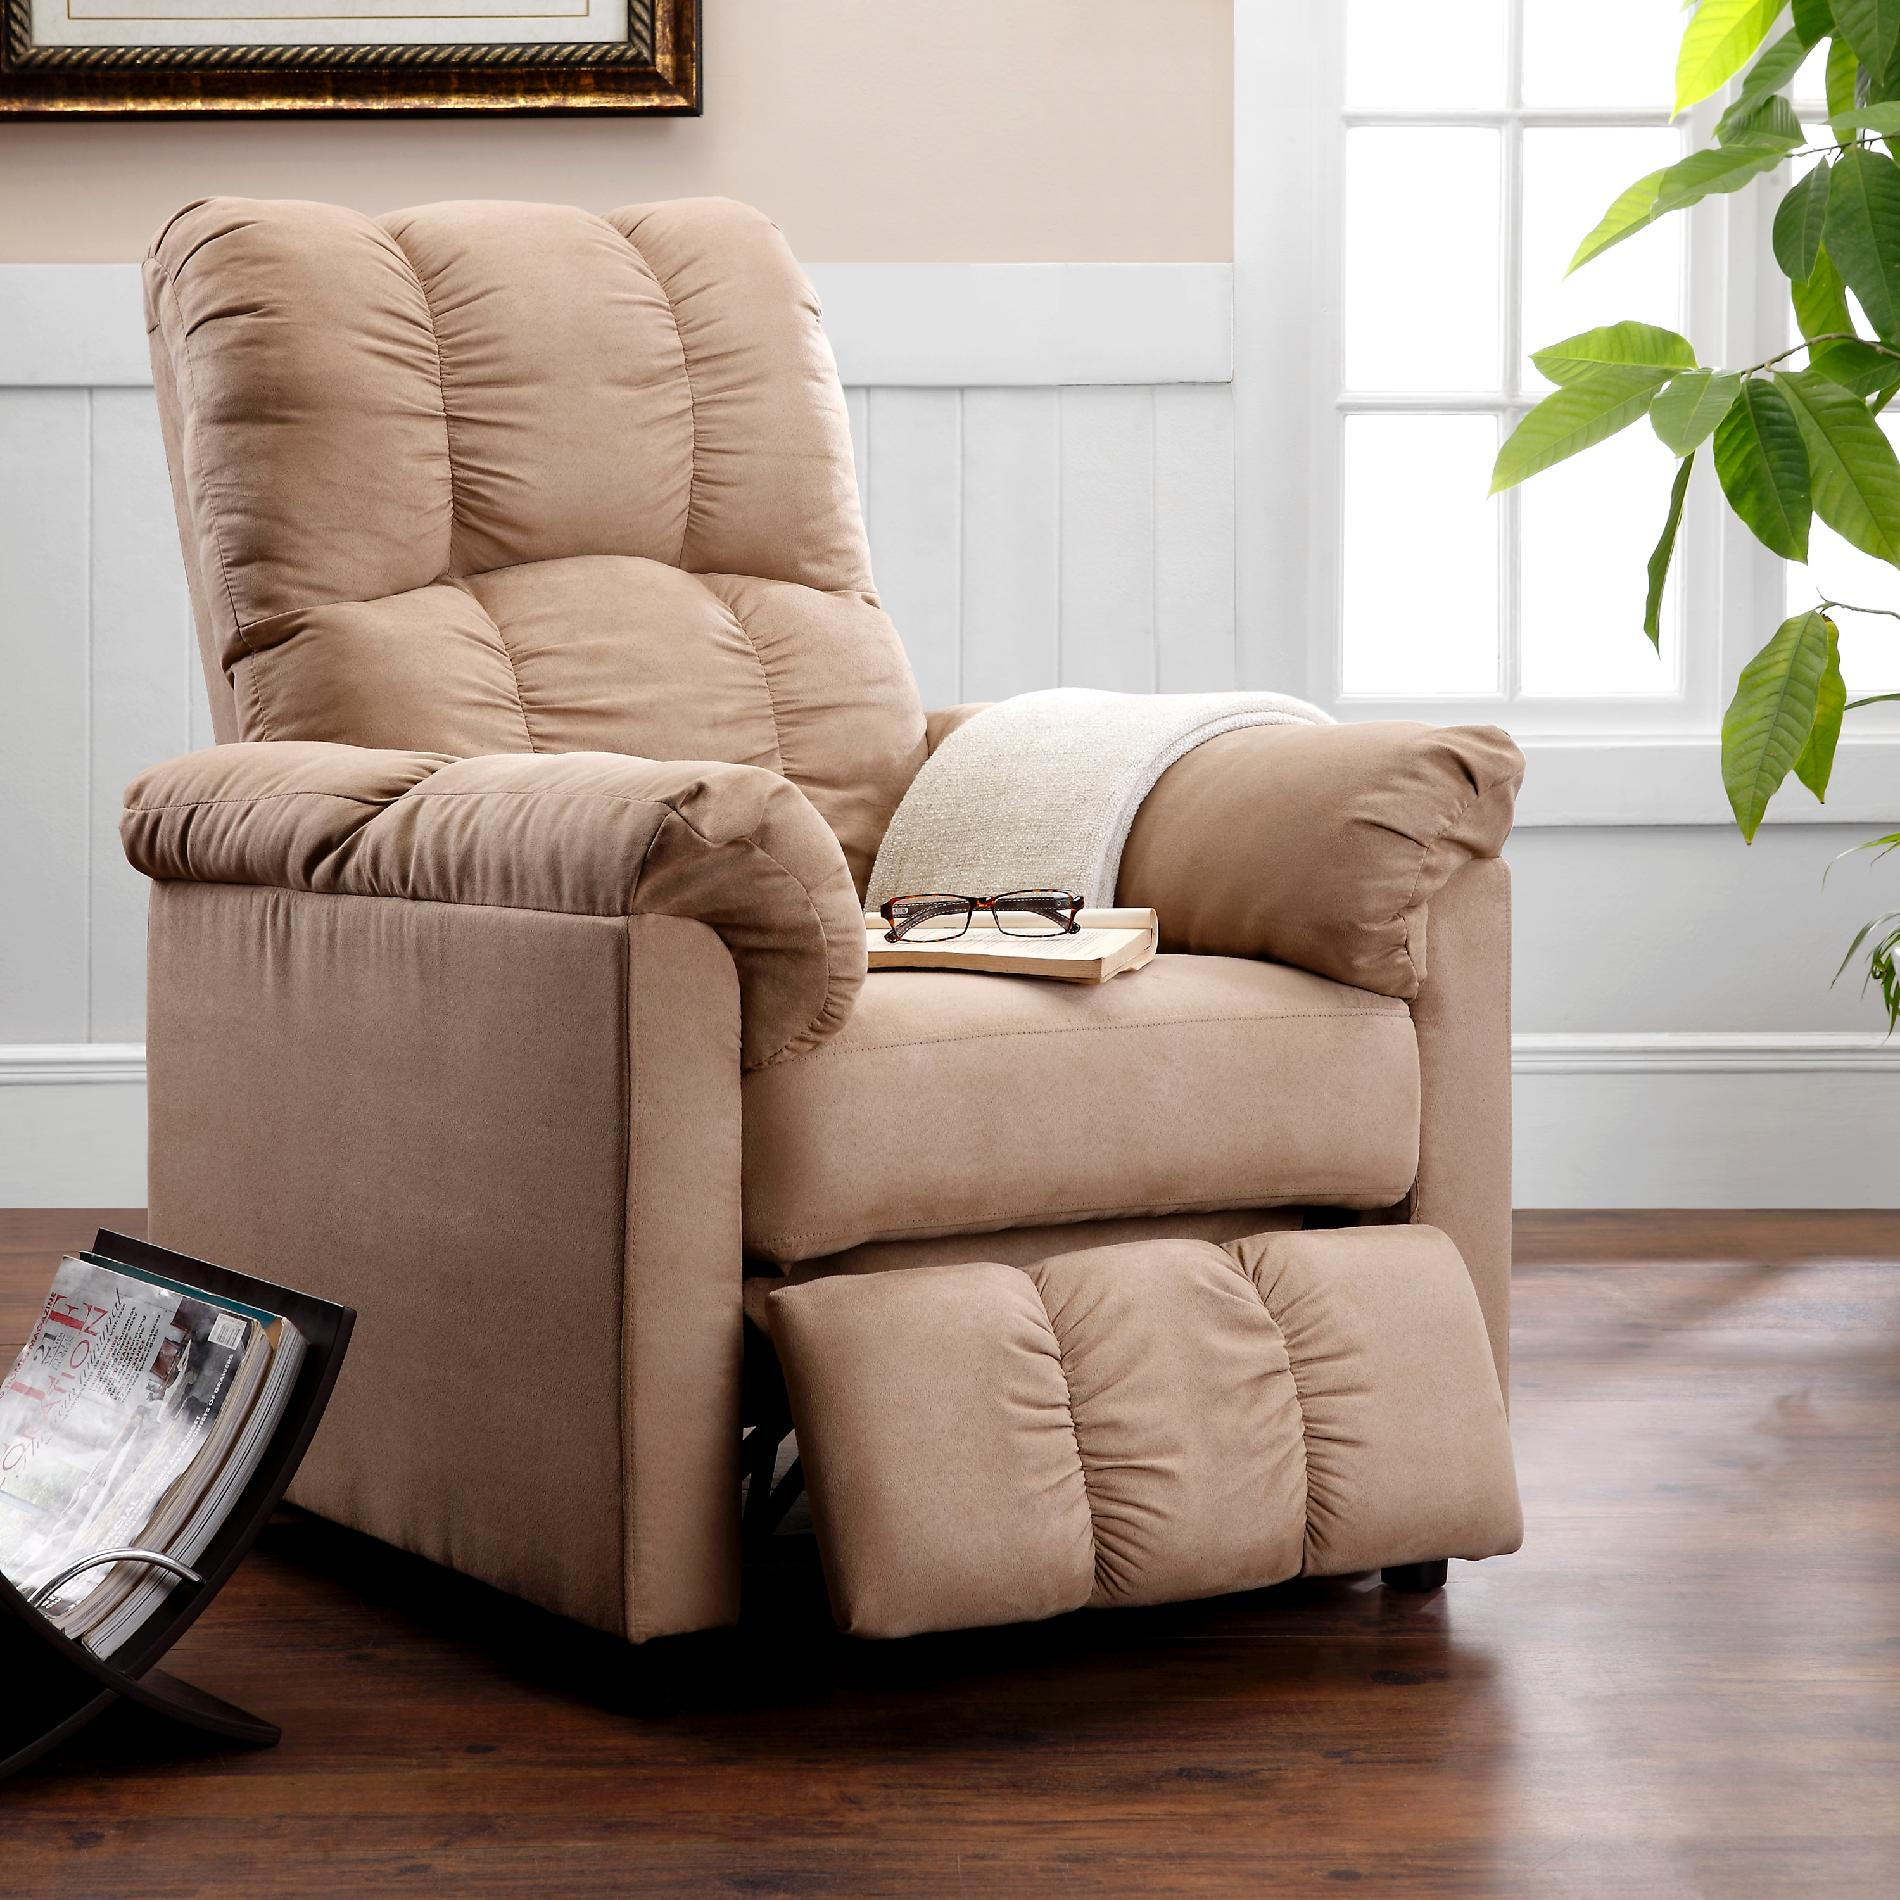 living room chairs for short people tiles dorel home furnishings slim beige microfiber recliner